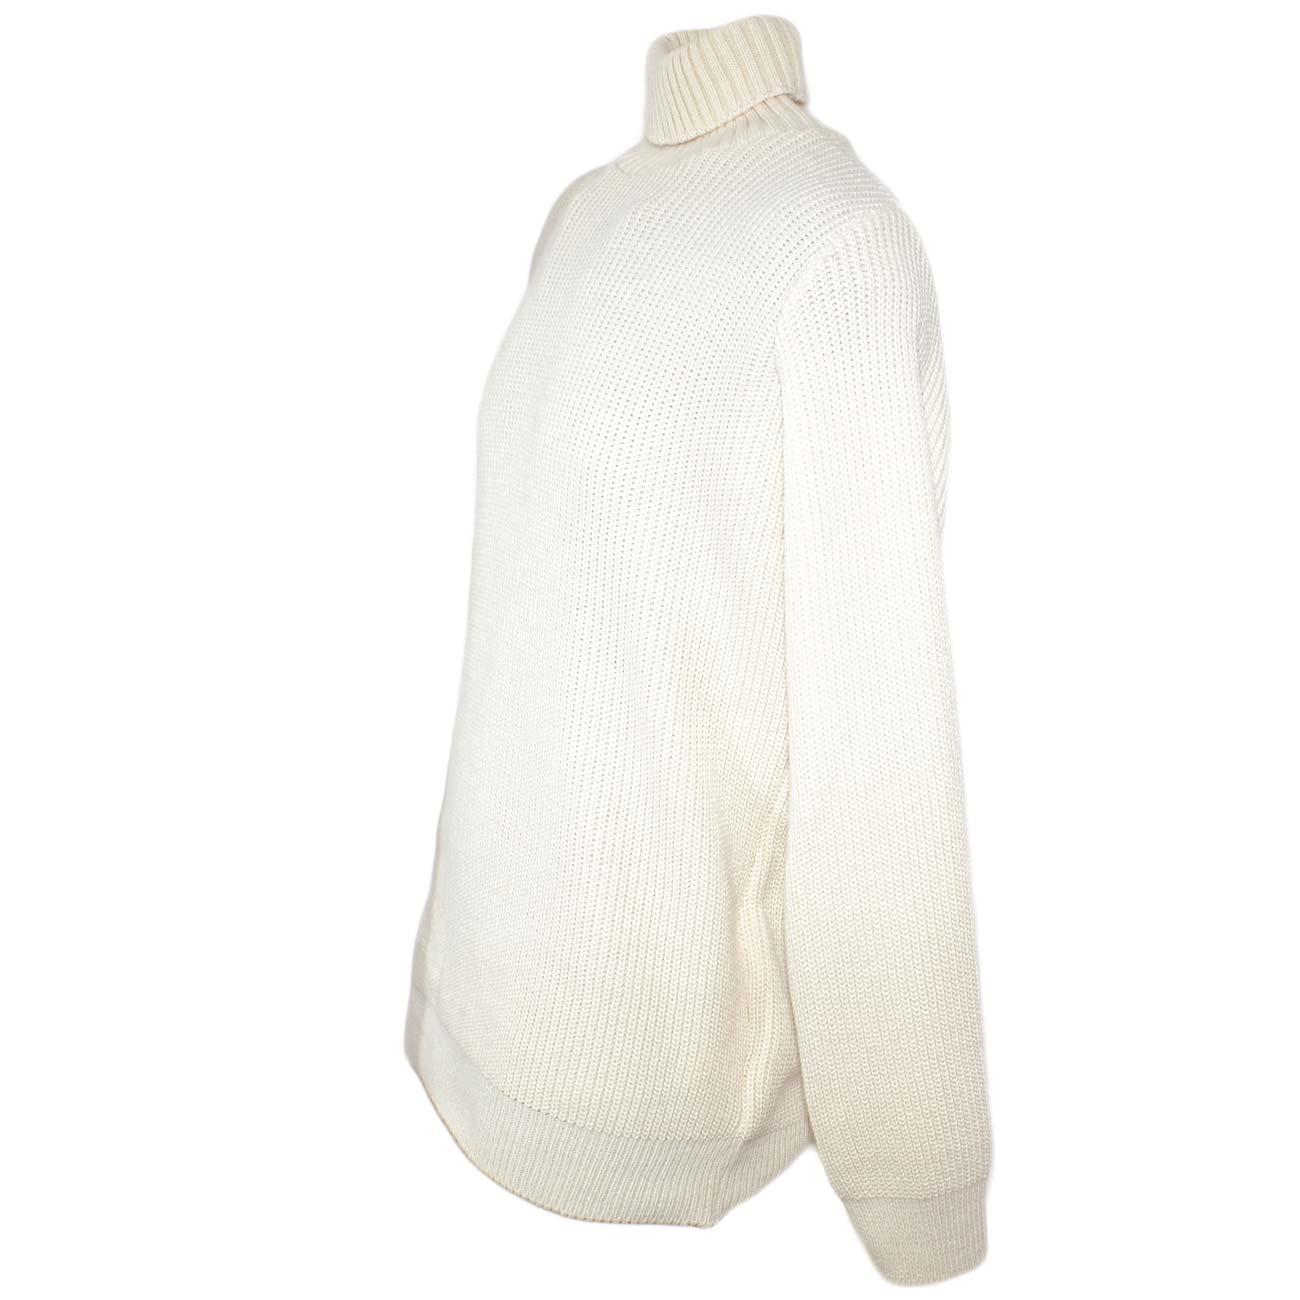 Maglione Intessitura Panna Dolcevita Ad Slim Color Lungo Fit Uomo ZFZ0qrW8